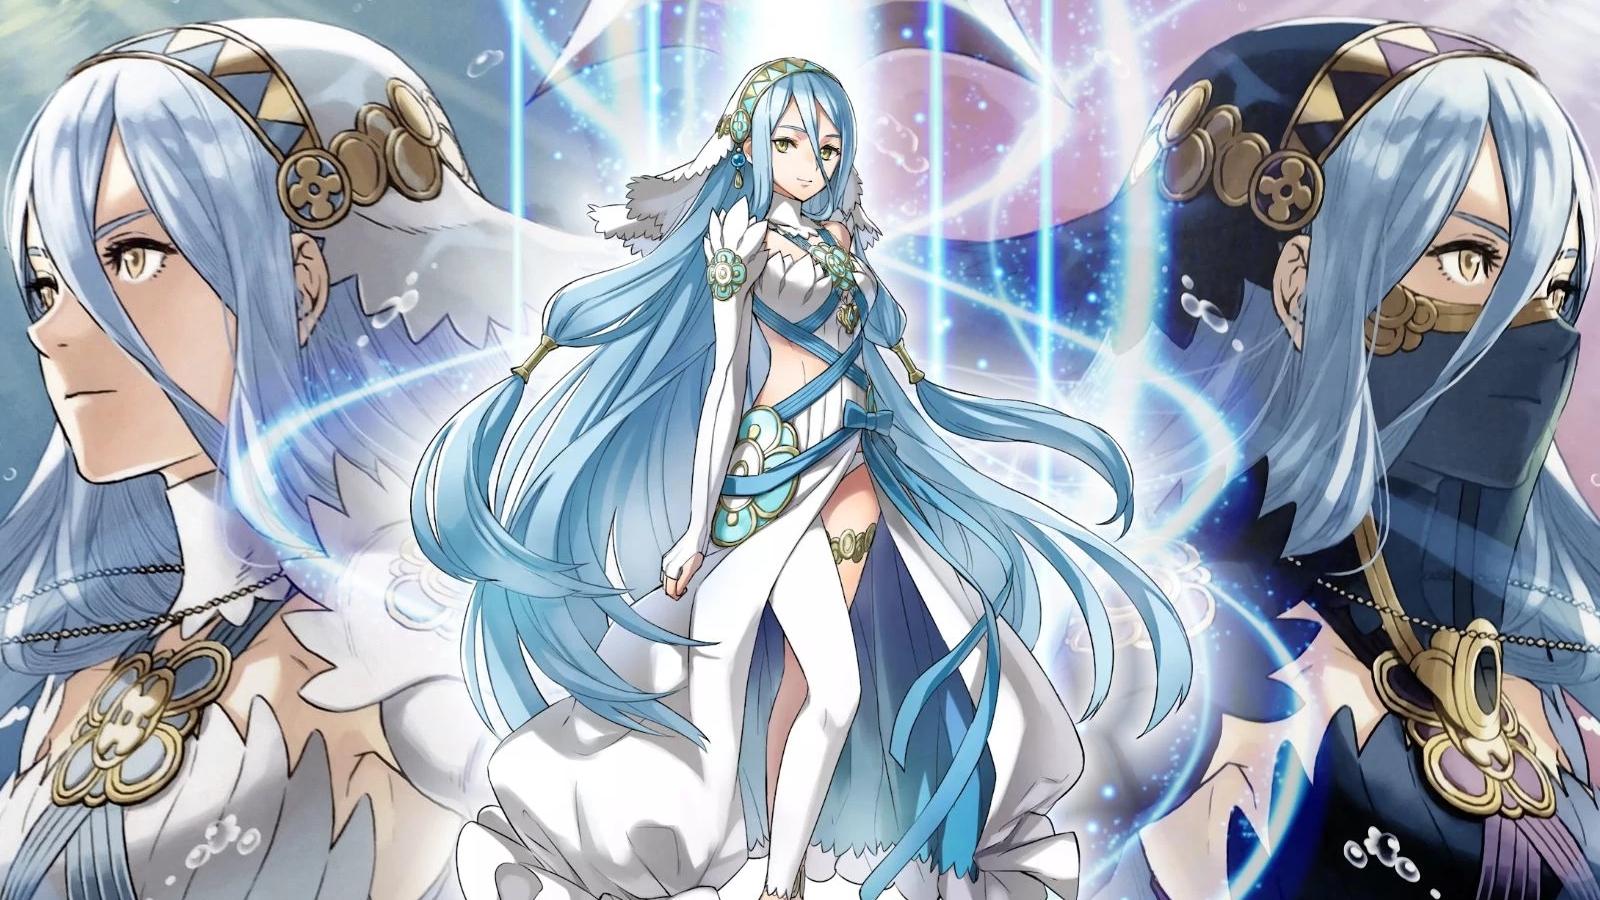 Azura from Fire Emblem Heroes